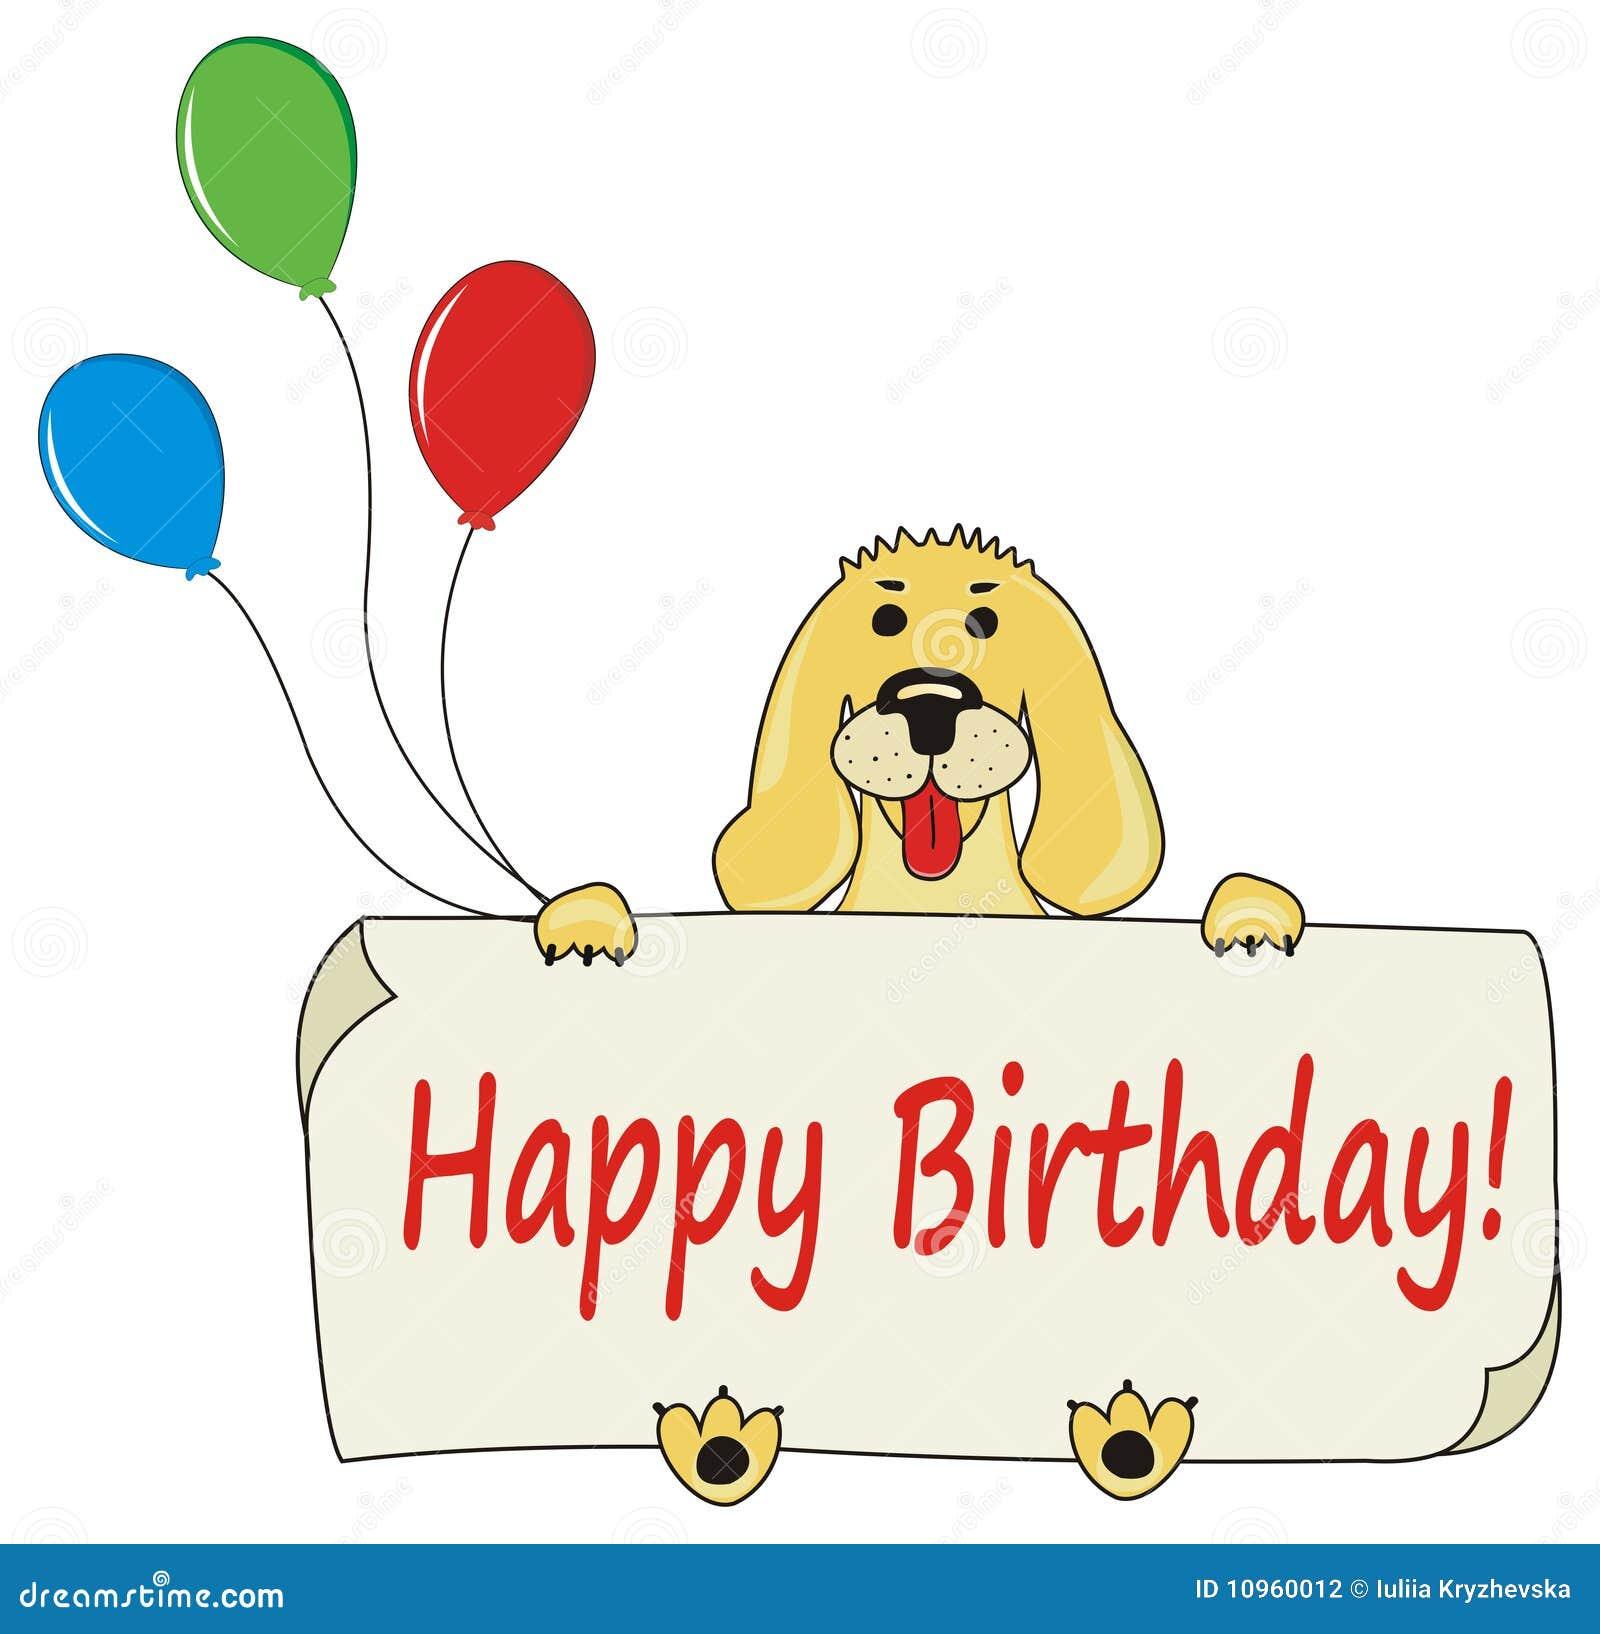 Happy Birthday Cartoon Dog Stock Illustrations 3 067 Happy Birthday Cartoon Dog Stock Illustrations Vectors Clipart Dreamstime